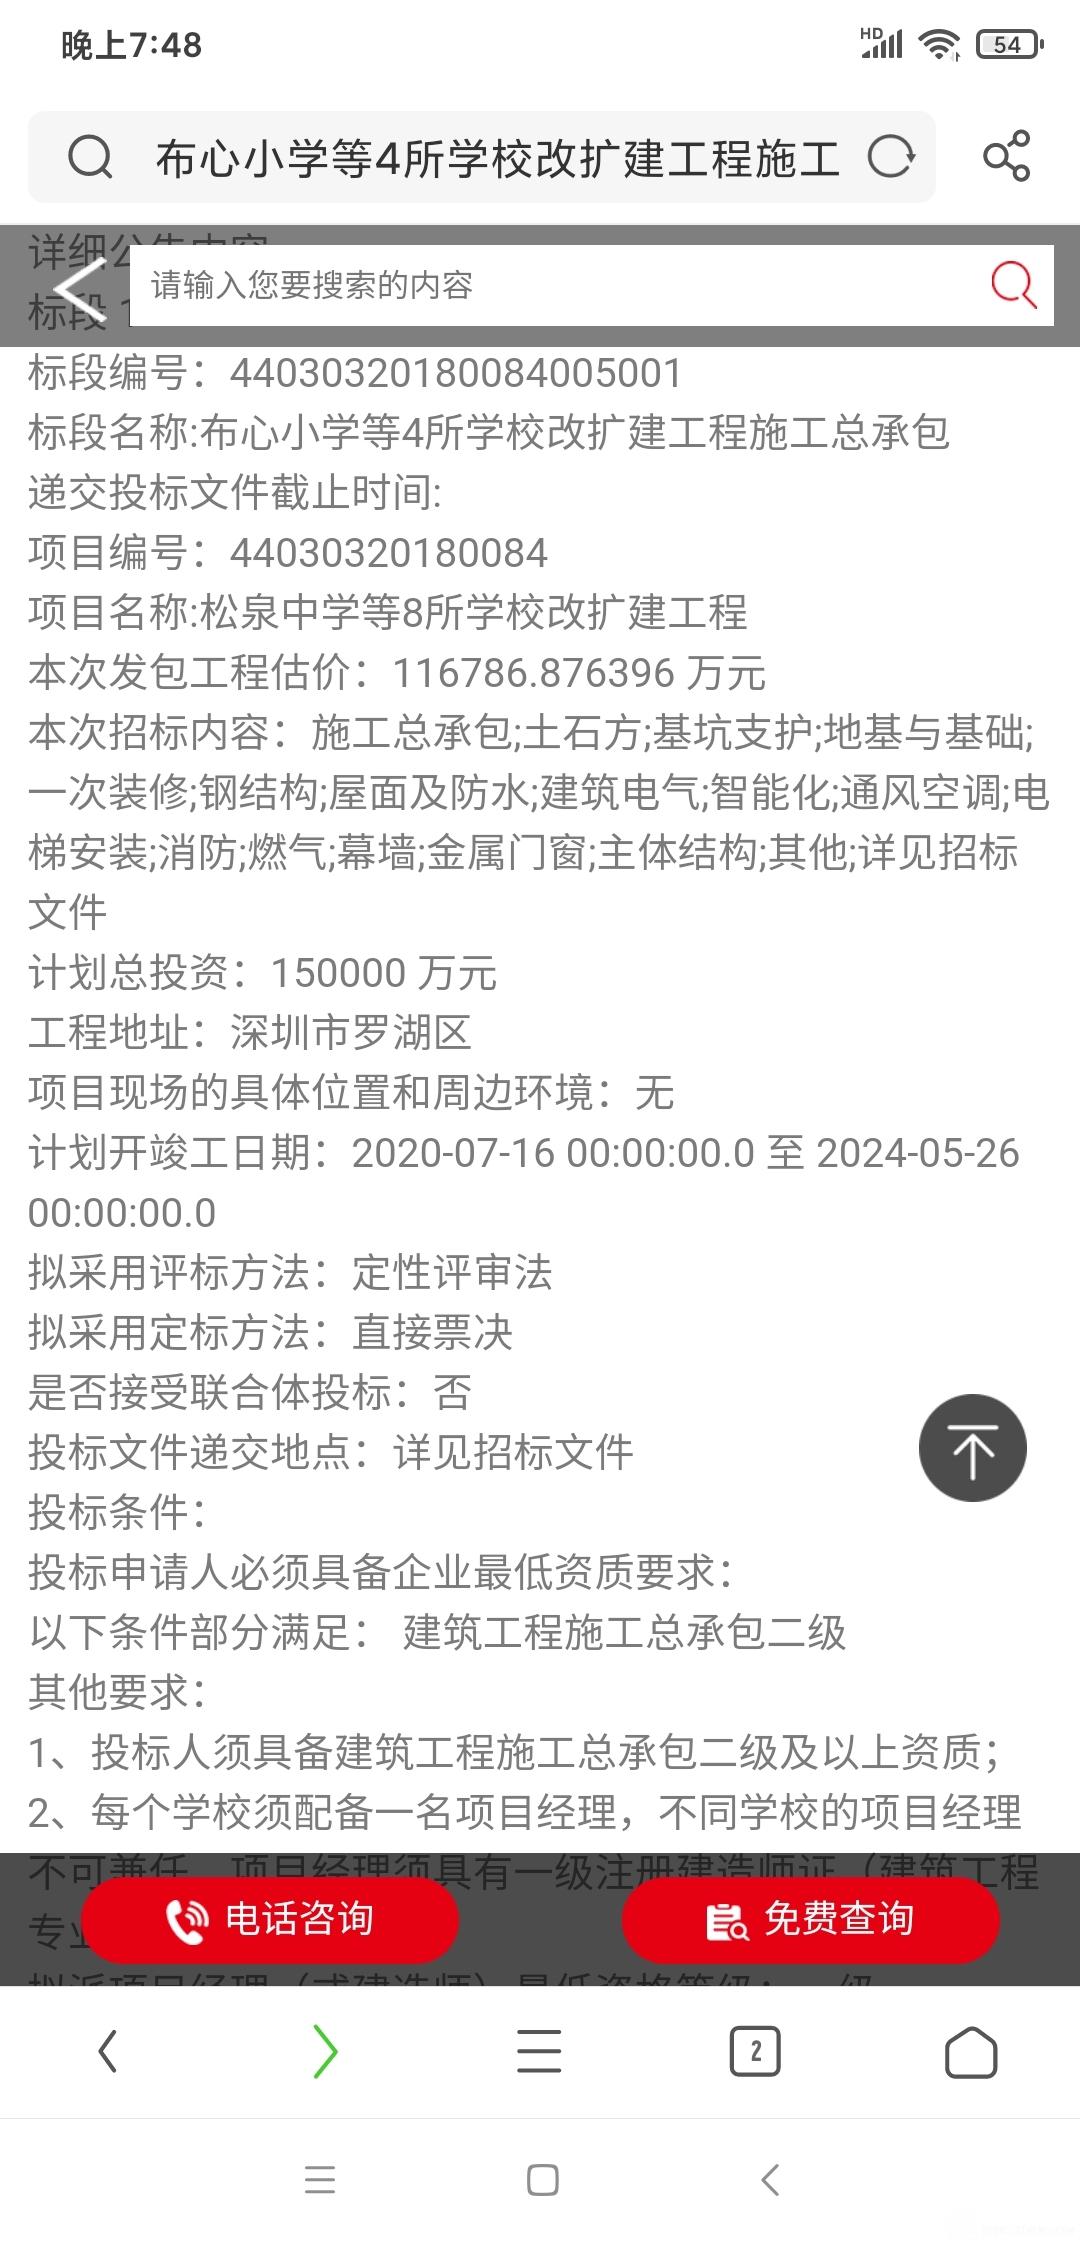 Screenshot_2021-01-11-19-48-36-561_com.UCMobile.jpg